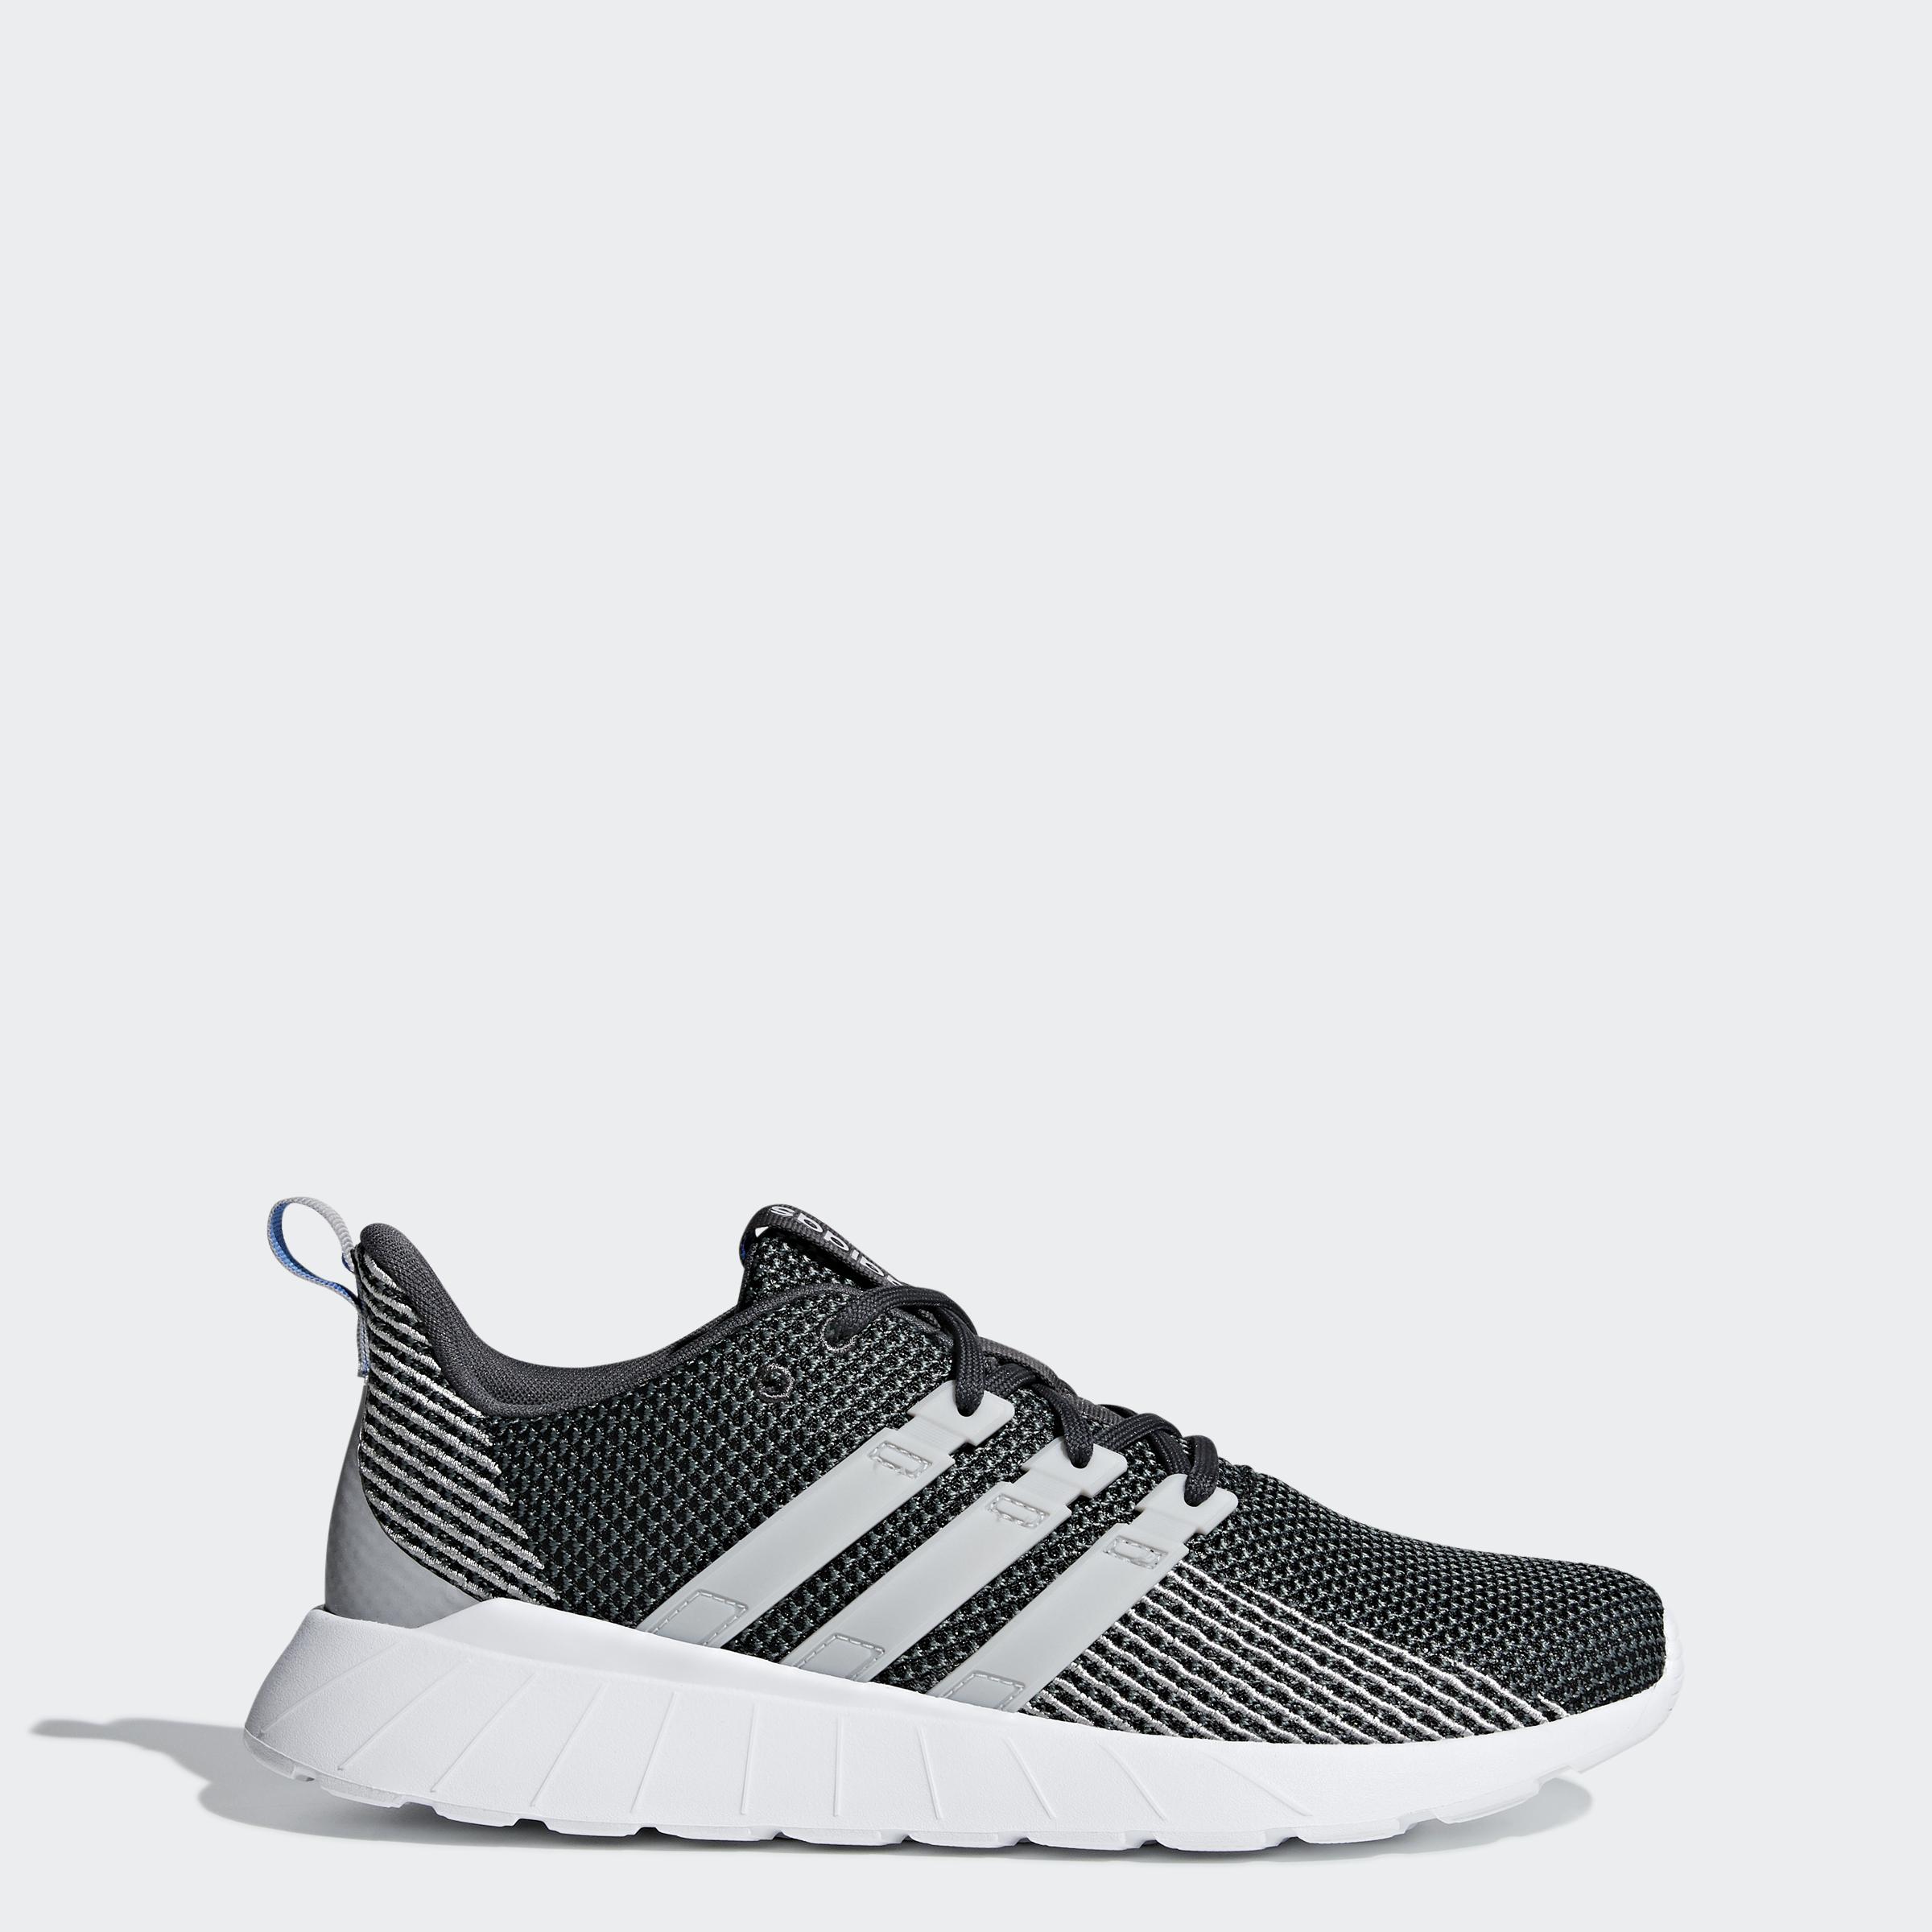 adidas-Questar-Flow-Shoes-Men-039-s thumbnail 19